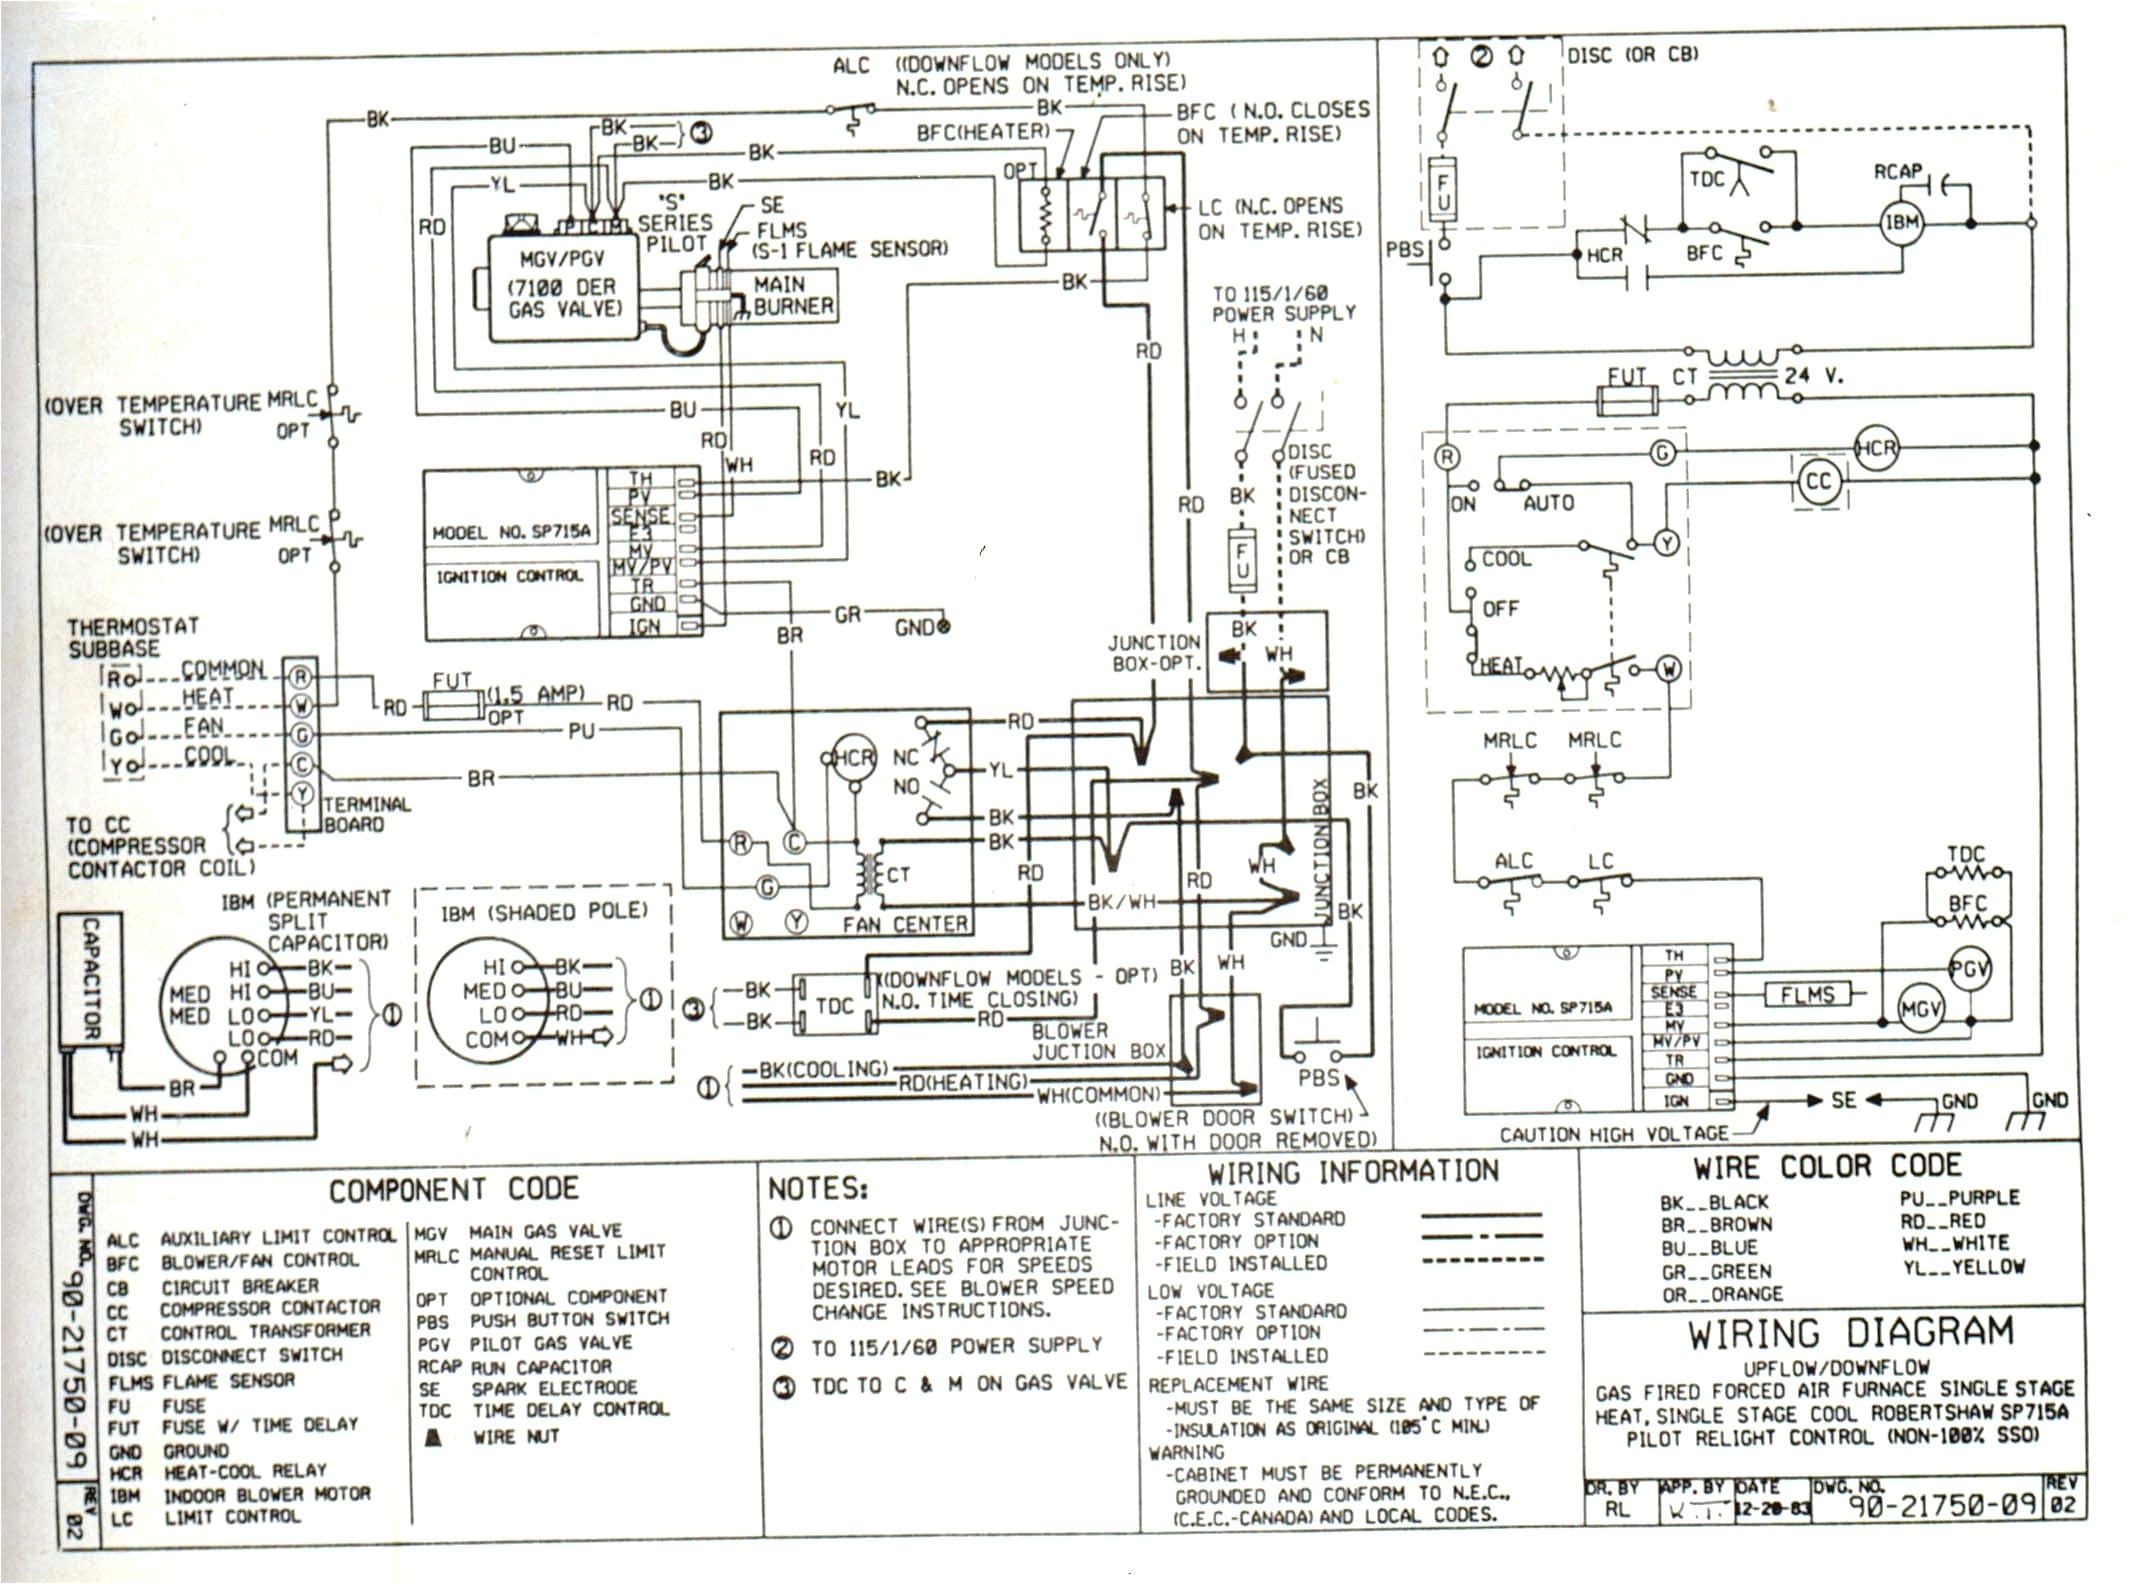 comfortmaker heat pump wiring diagram wiring diagram schematic comfortmaker furnace forced air wiring diagram